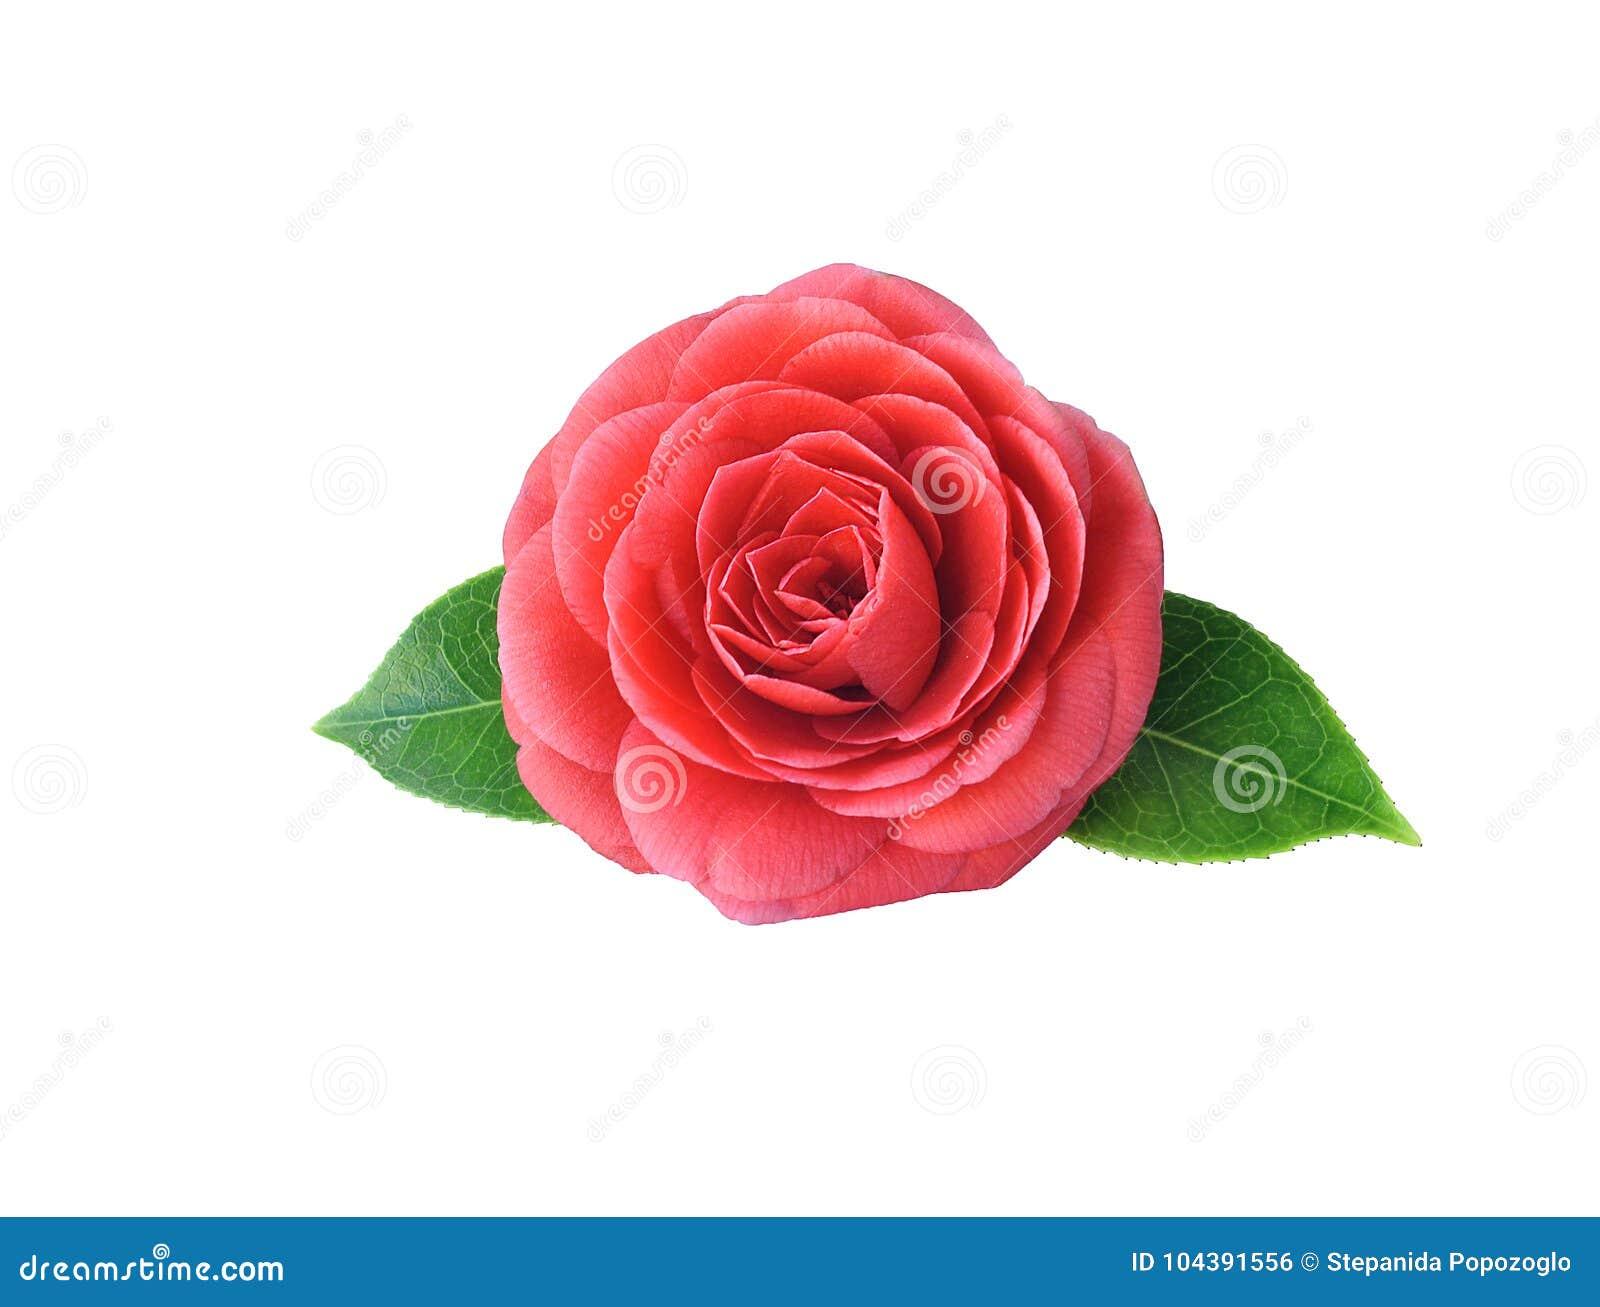 Camellia Isolated On White Background Spring Japanese Flower W